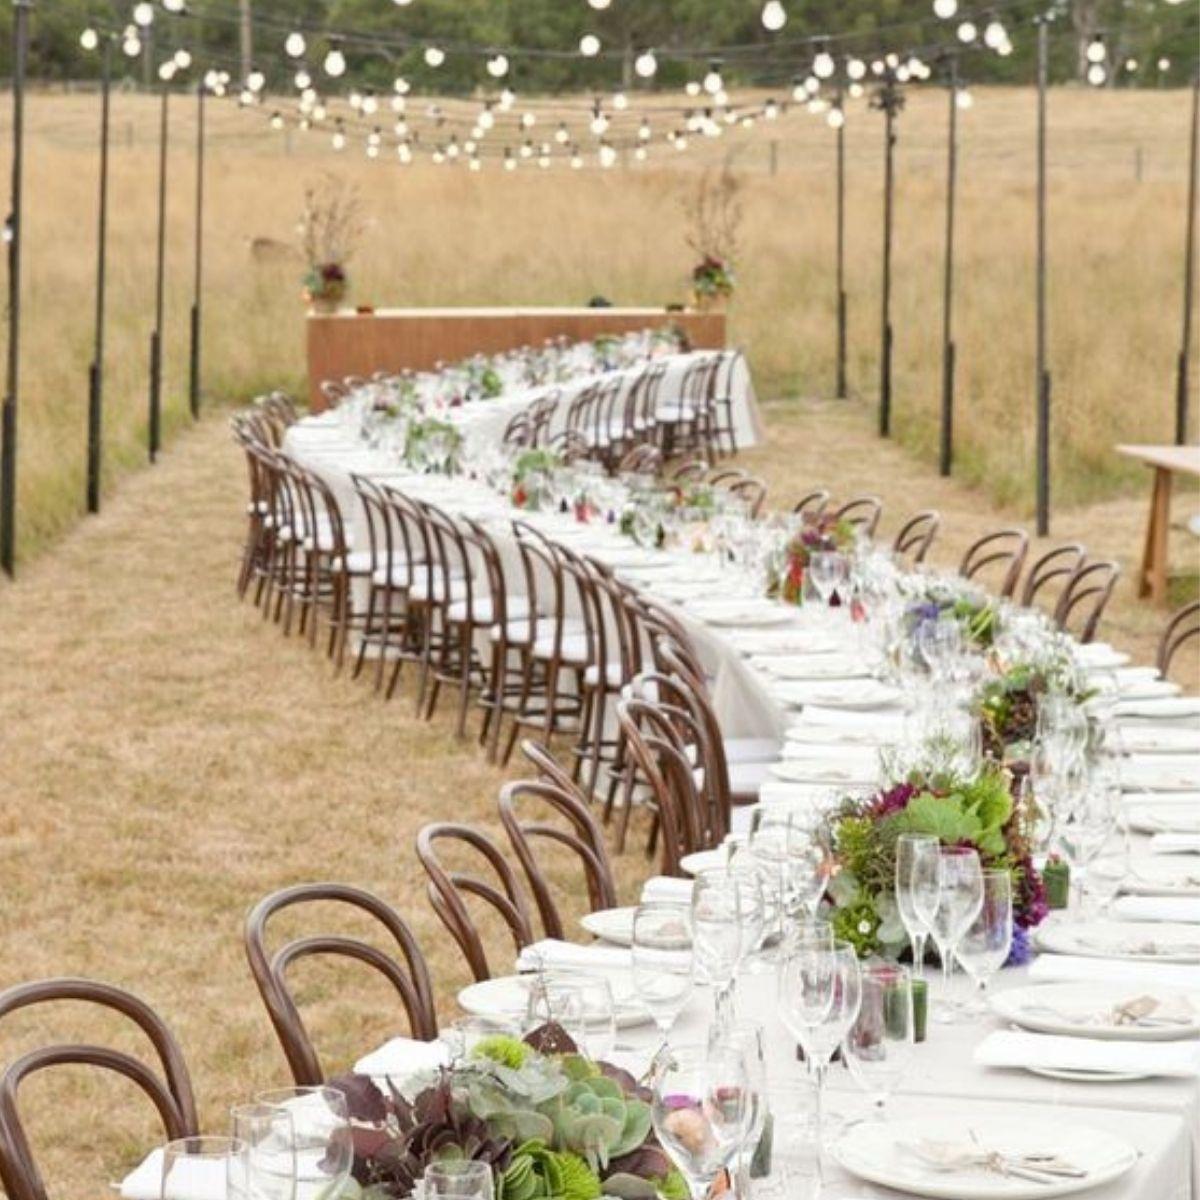 Wedding Reception Seating Configuration Ideas - serpentine